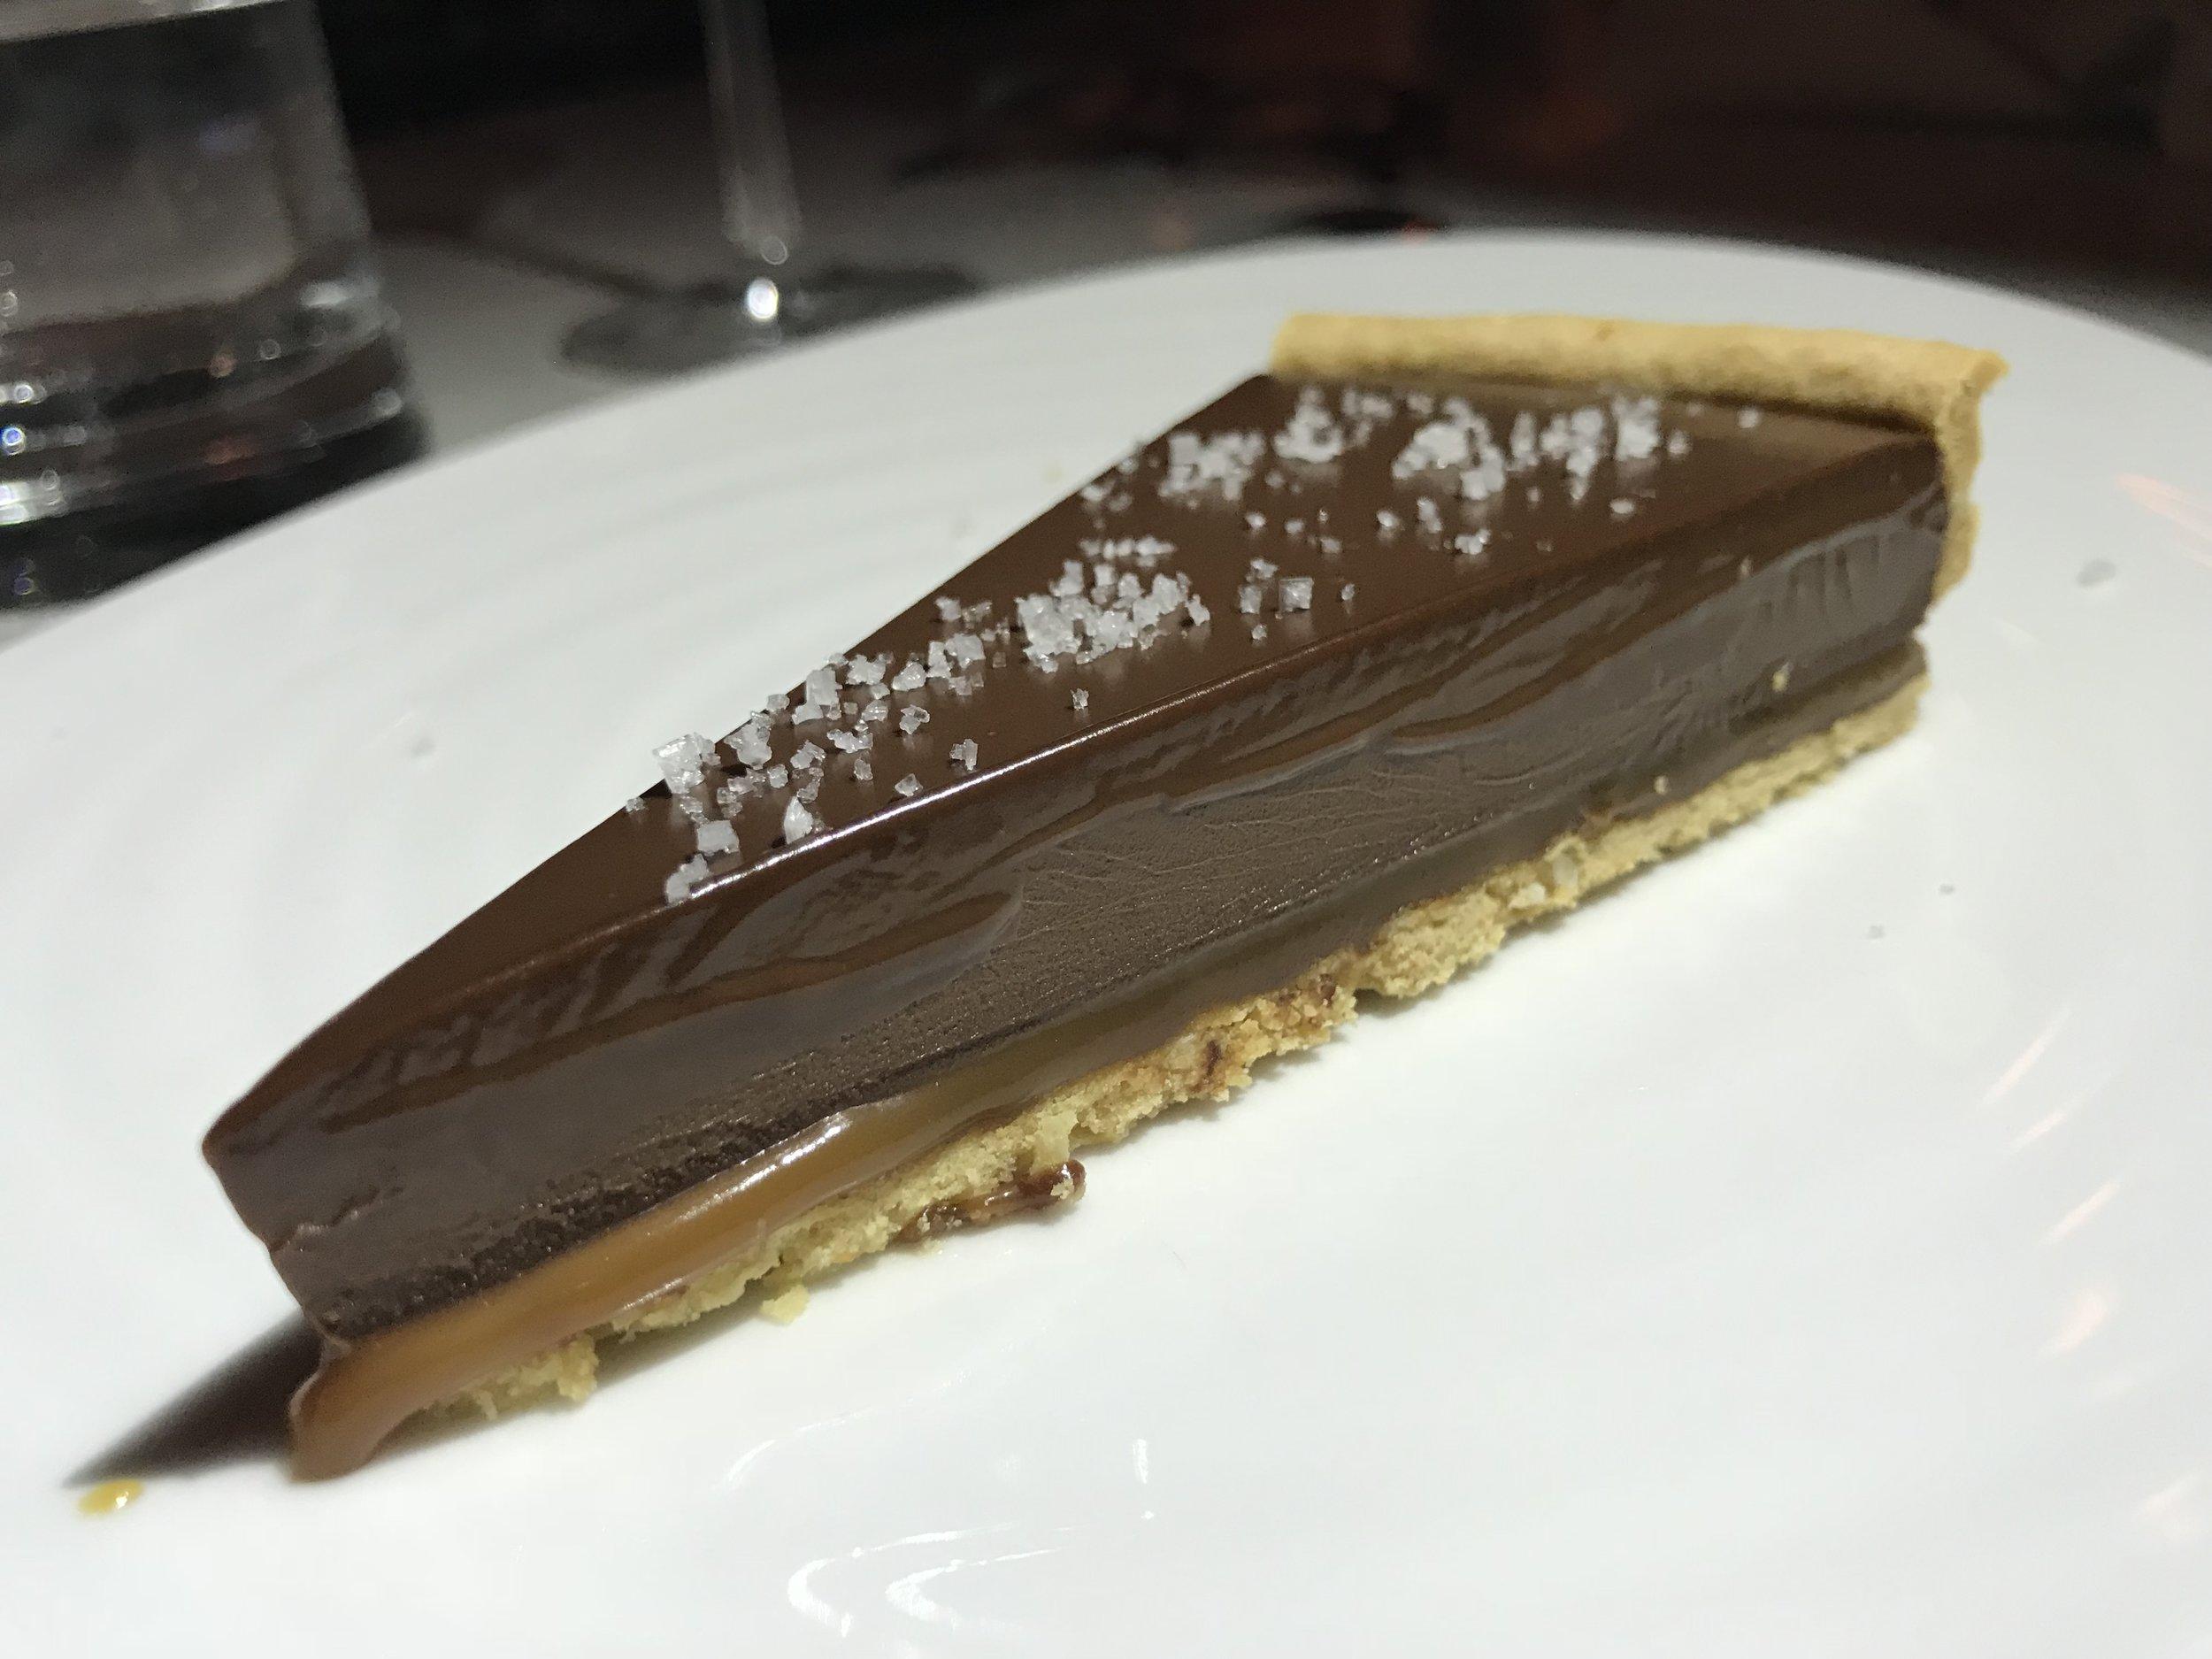 NYC's #1 chocolate caramel tart, Racine's.